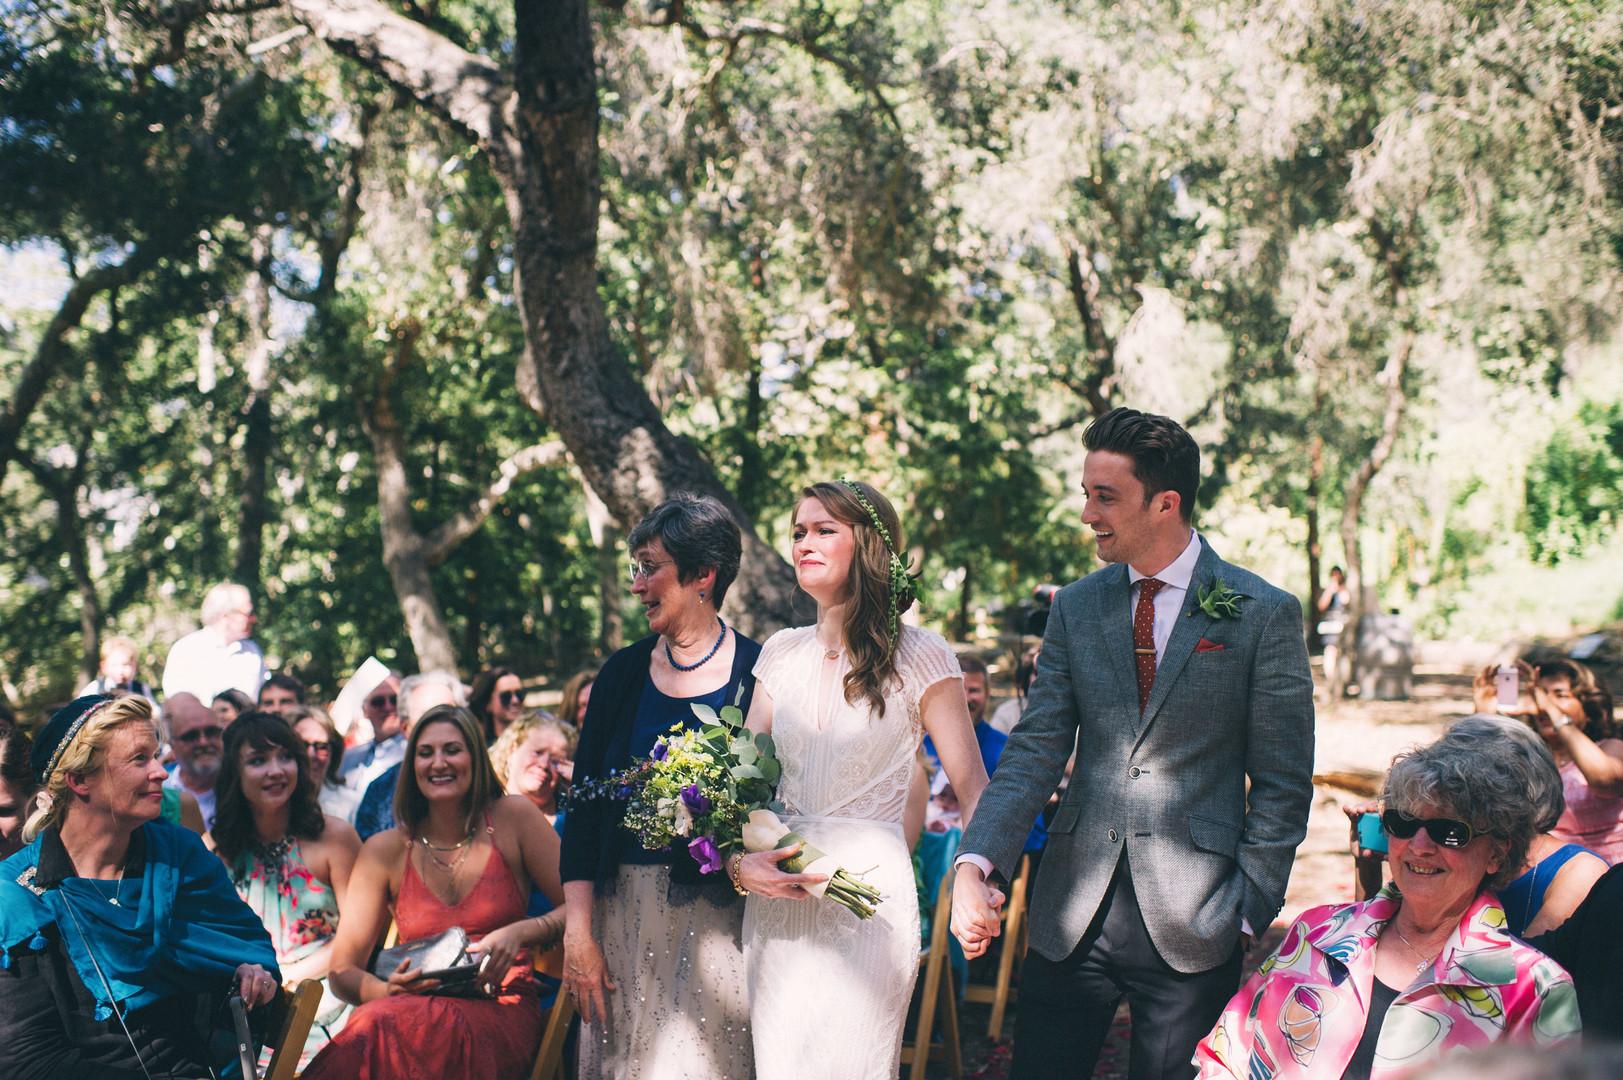 www.santabarbarawedding.com | Sarah Katherine Davis Photography | Santa Barbara Museum of Natural History | Wild Heart Events | Ella and Louie | Party Pleasers | Bride Enters Ceremony